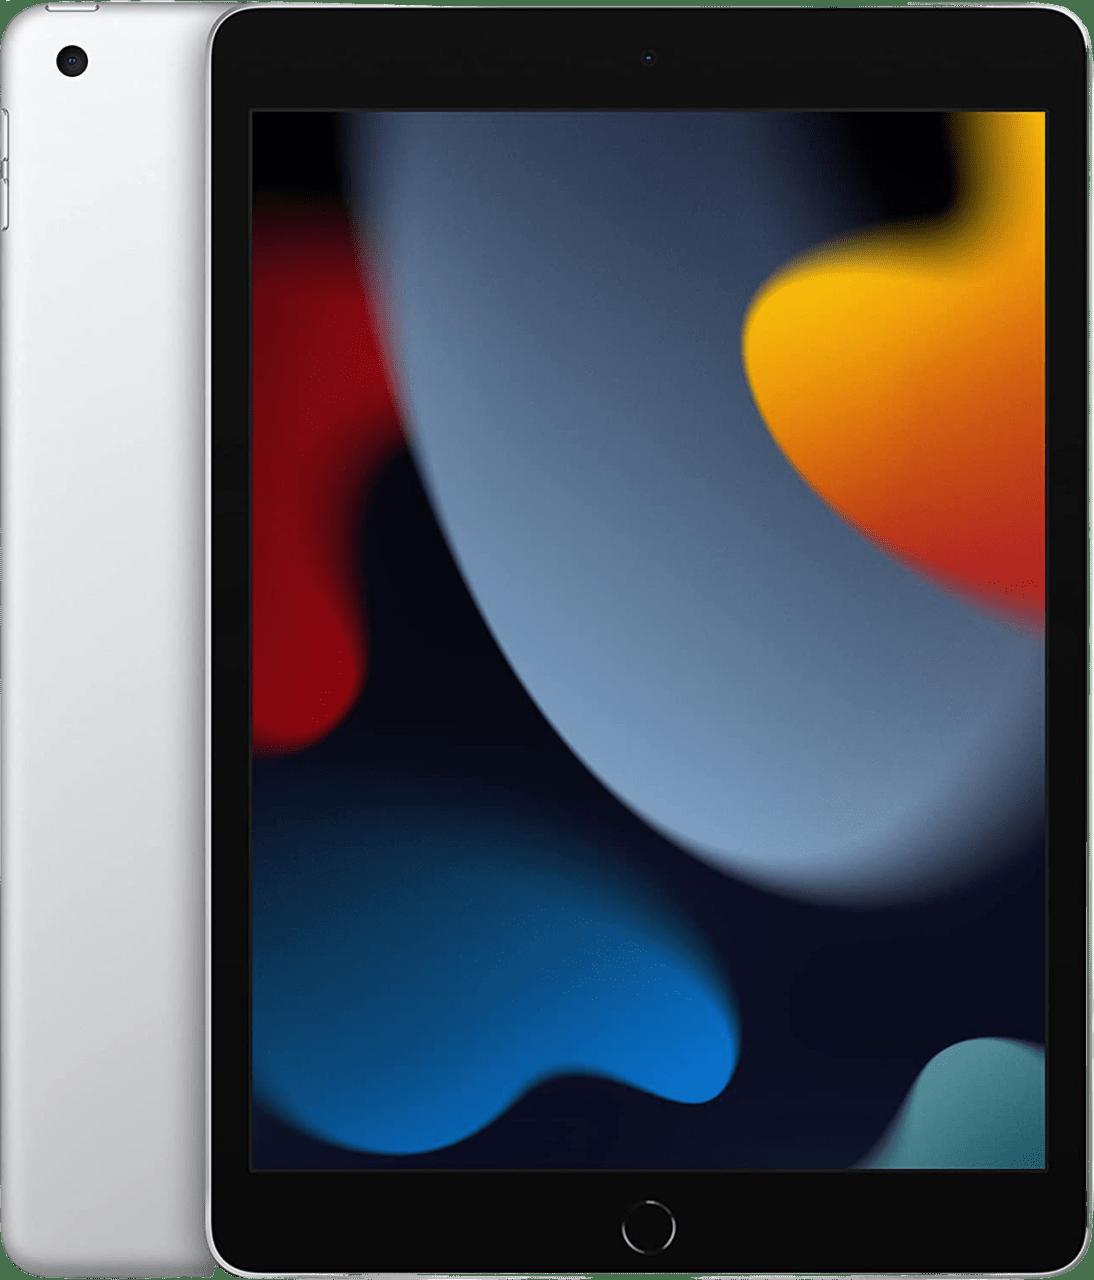 Silber Apple iPad (2021) - LTE - iOS 15 - 64GB.1